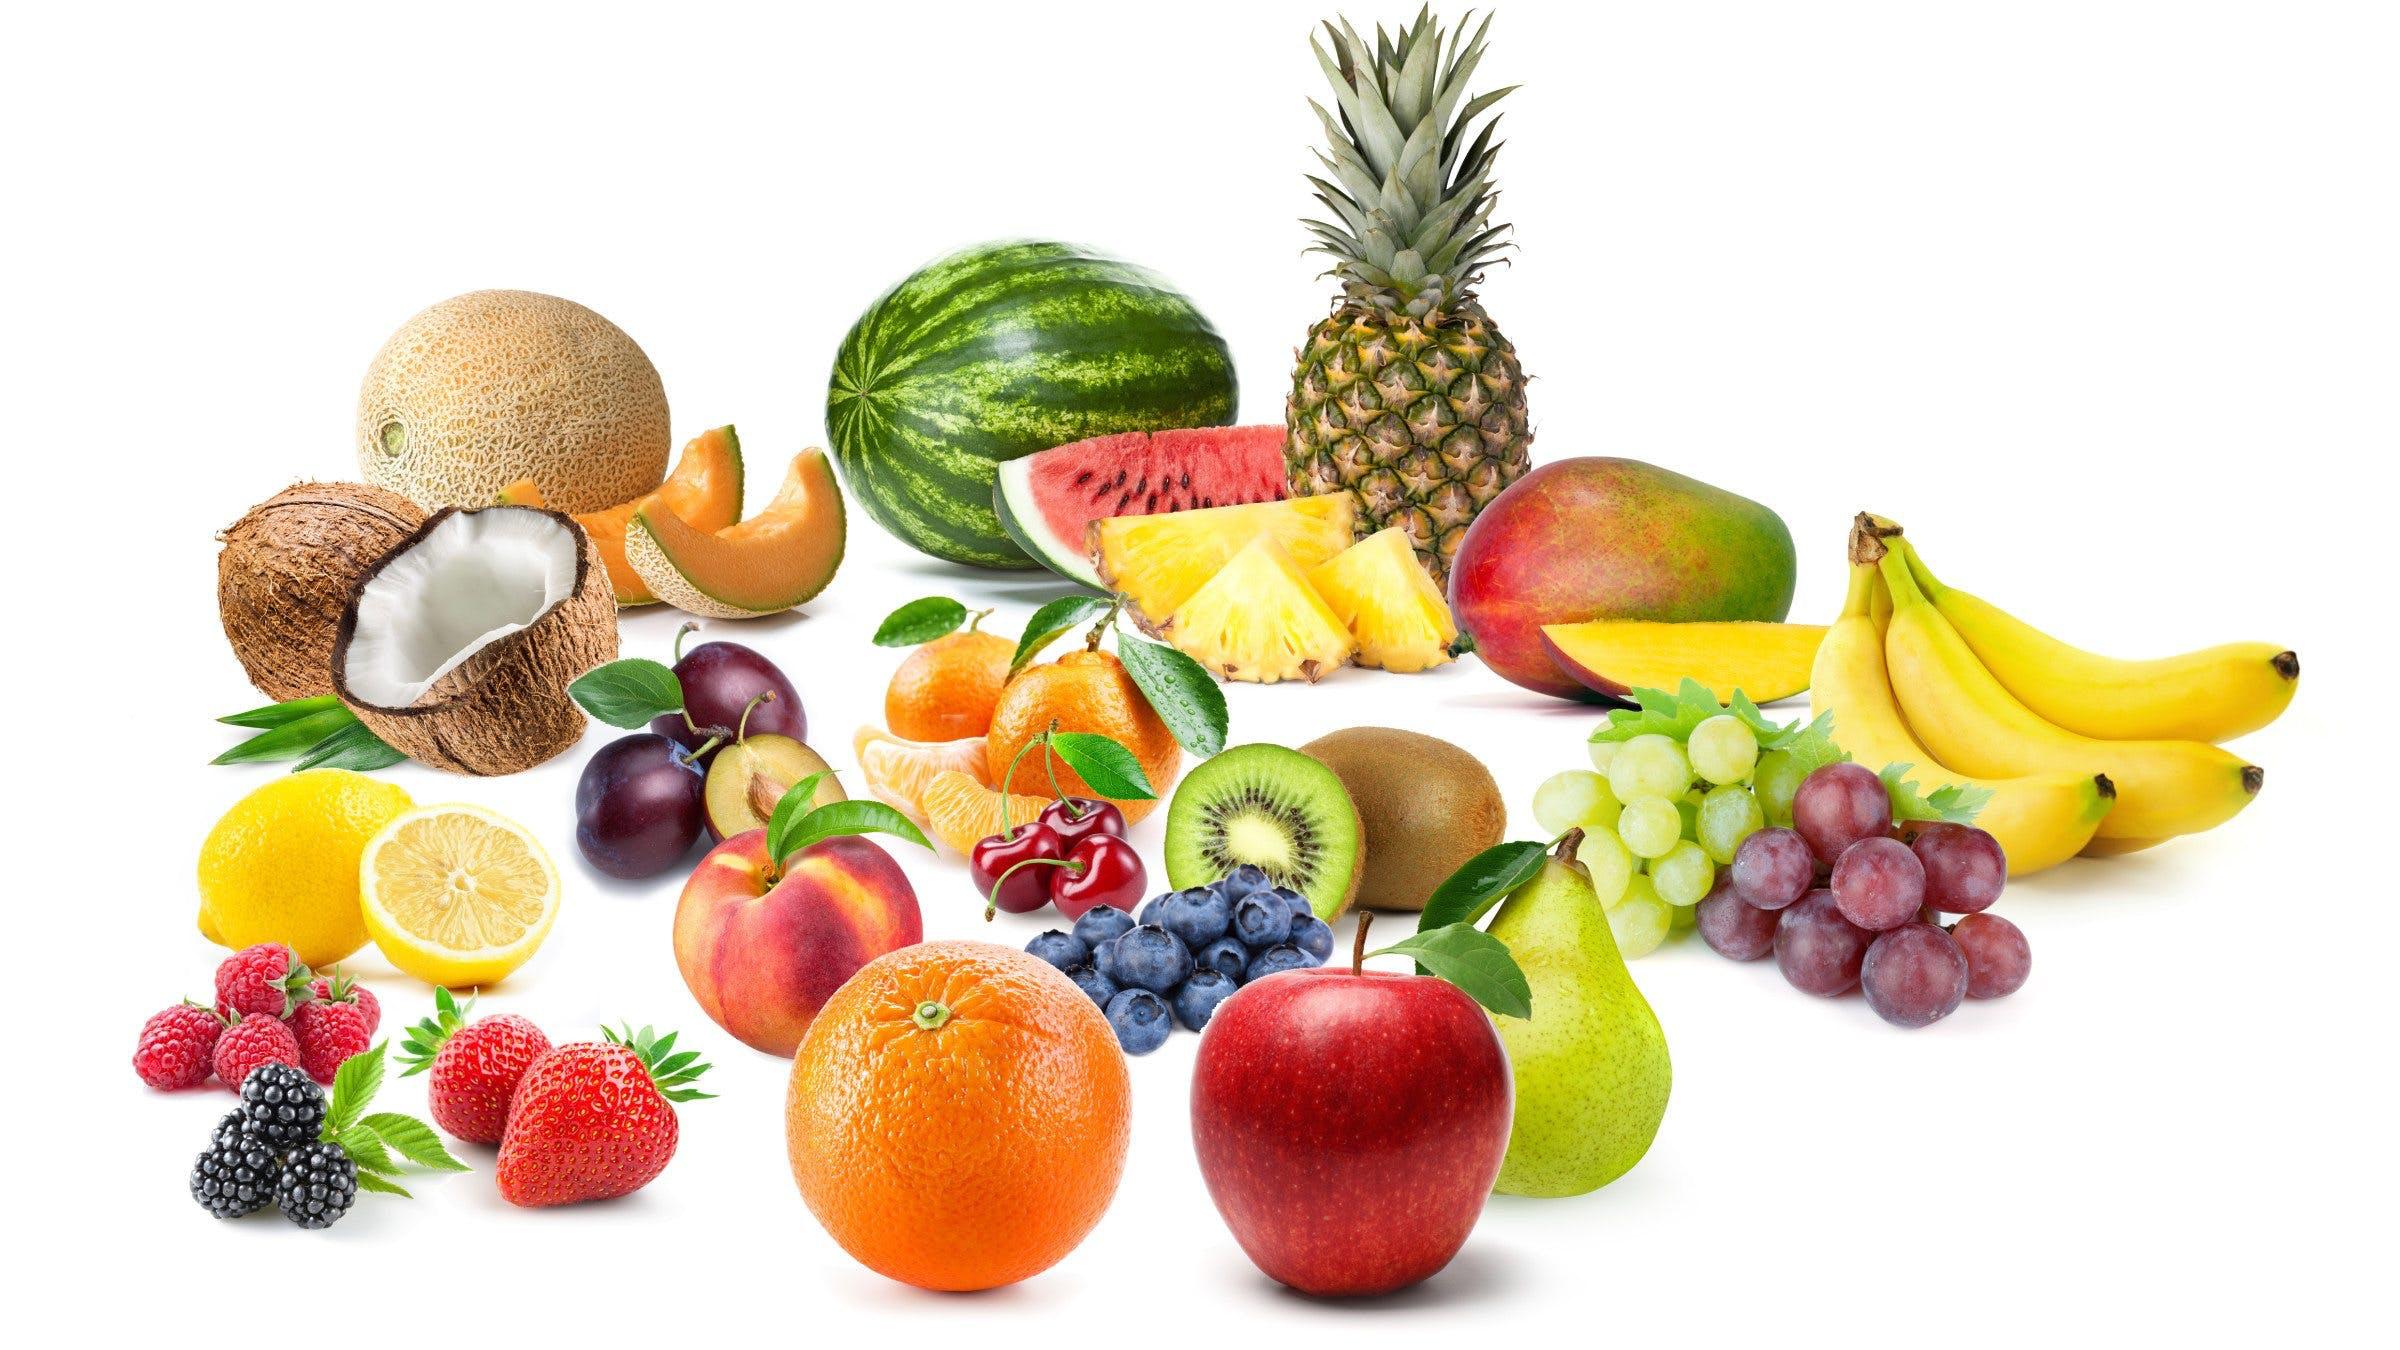 Low-Carb-Fruits-16-9-1-2400x1350